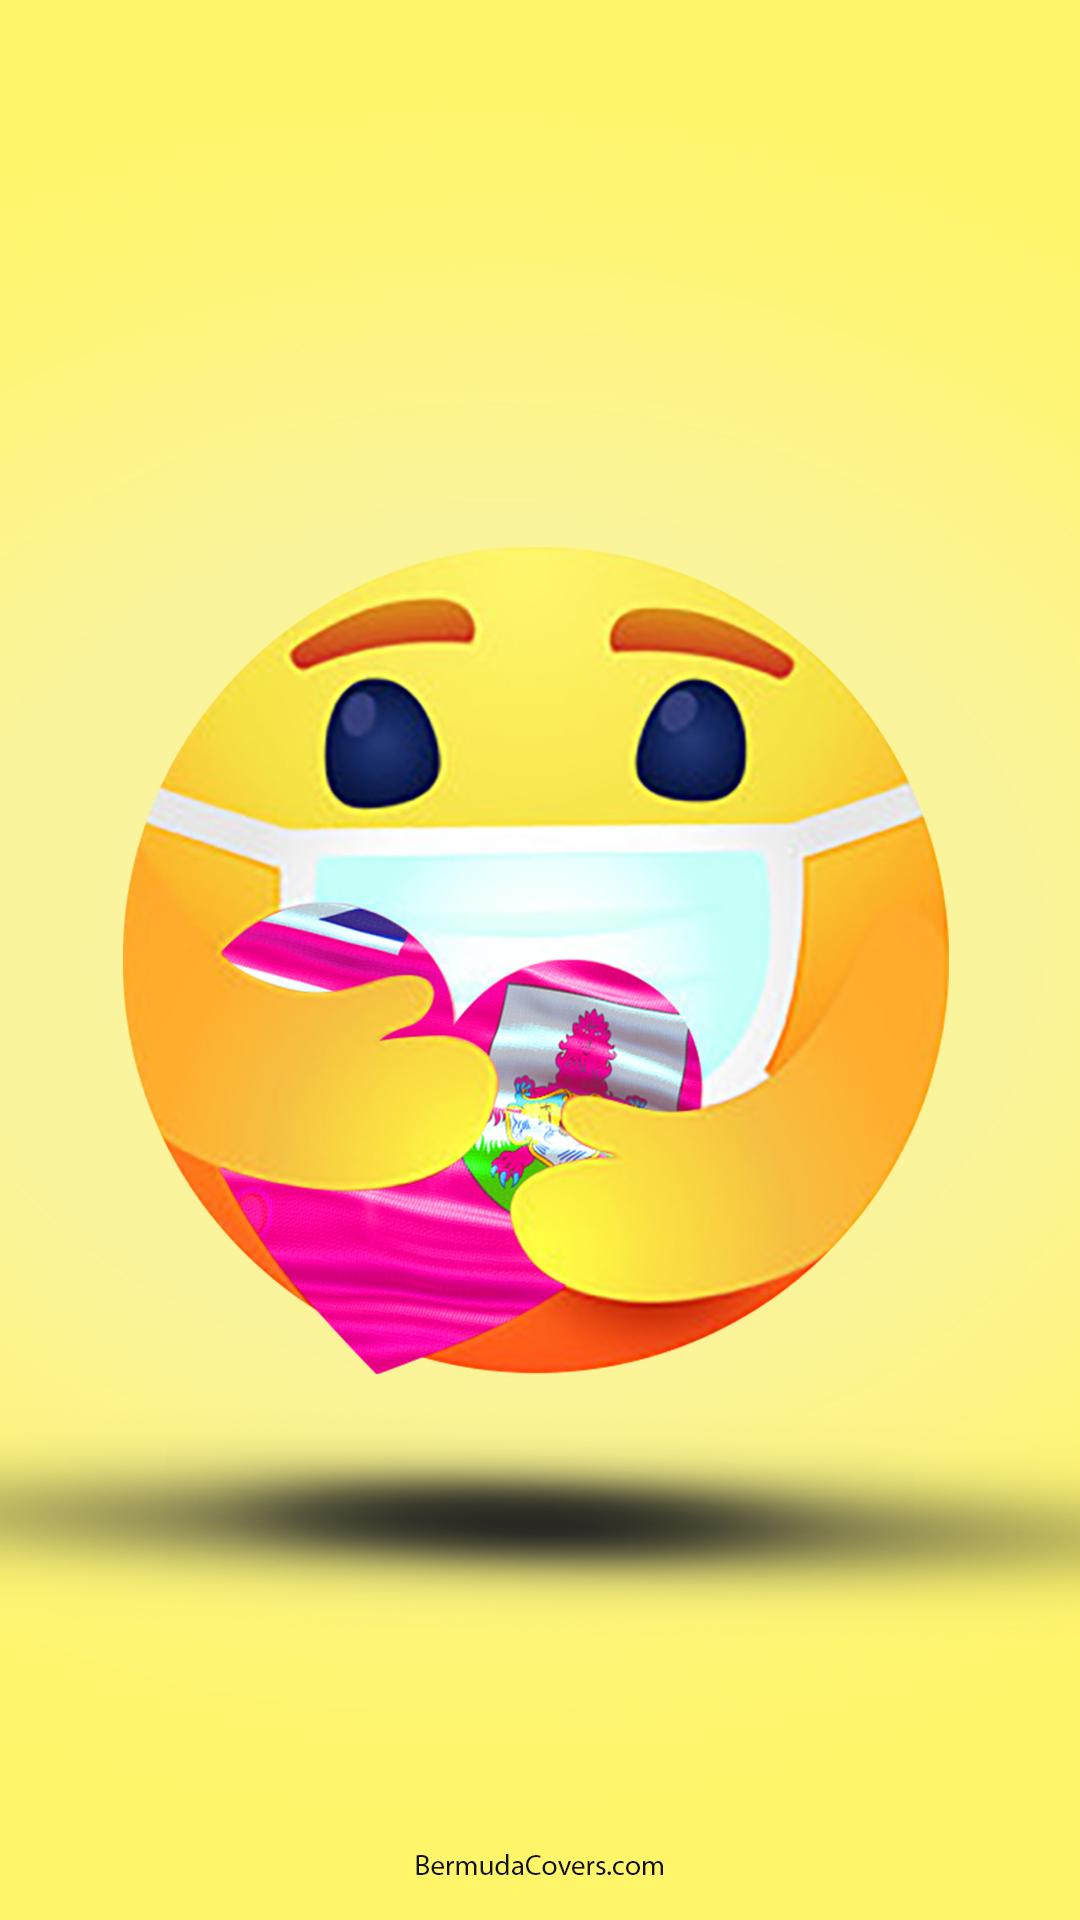 Emoji Heart Hug Mask Bermuda Yellow Bernews Mobile phone wallpaper lock screen design image photo YyDNzgkN yellow